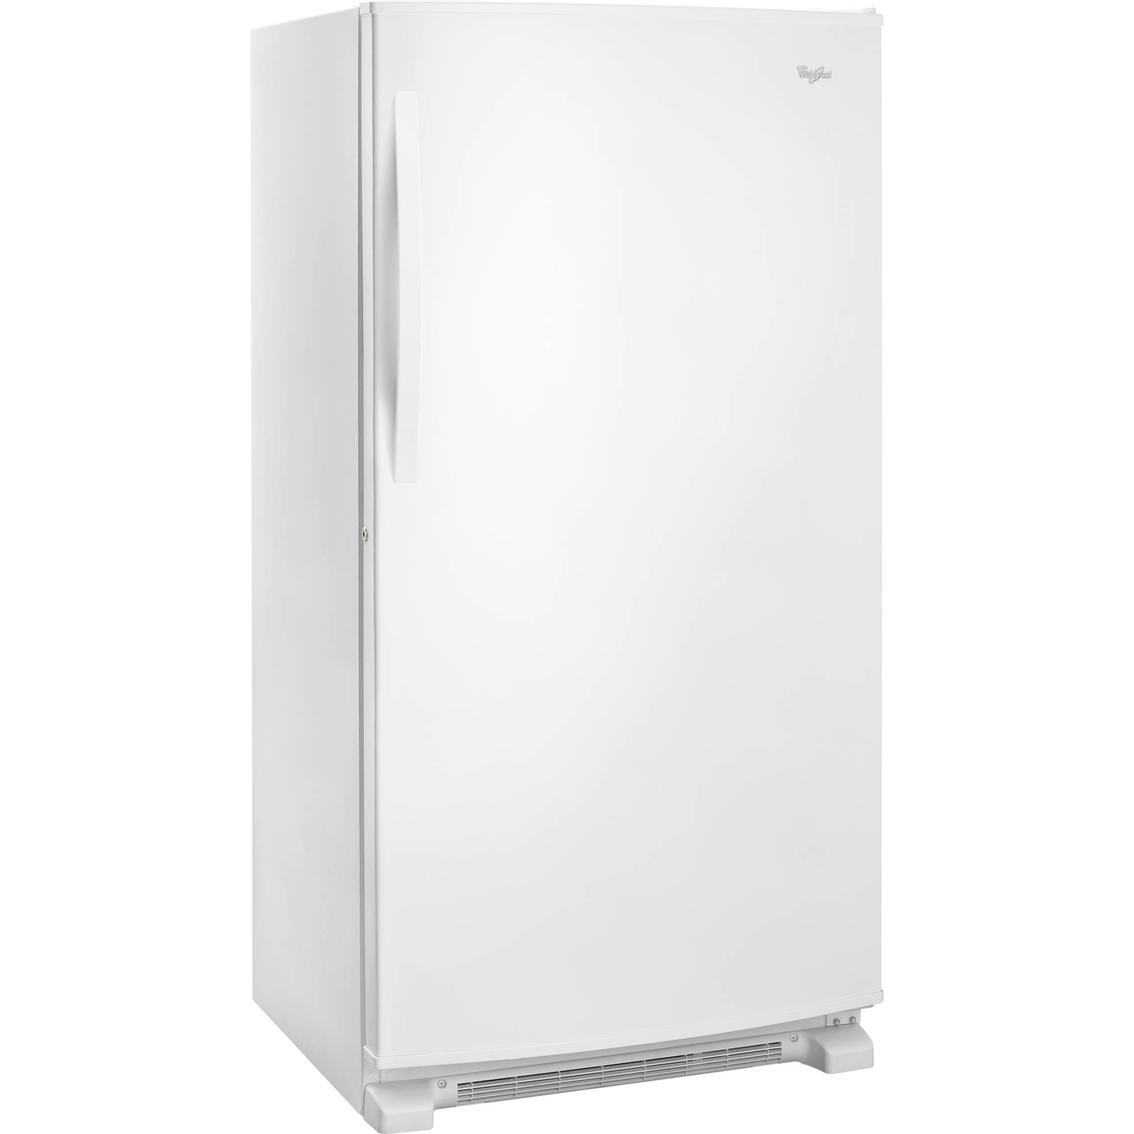 Ft Frost Free Upright Freezer